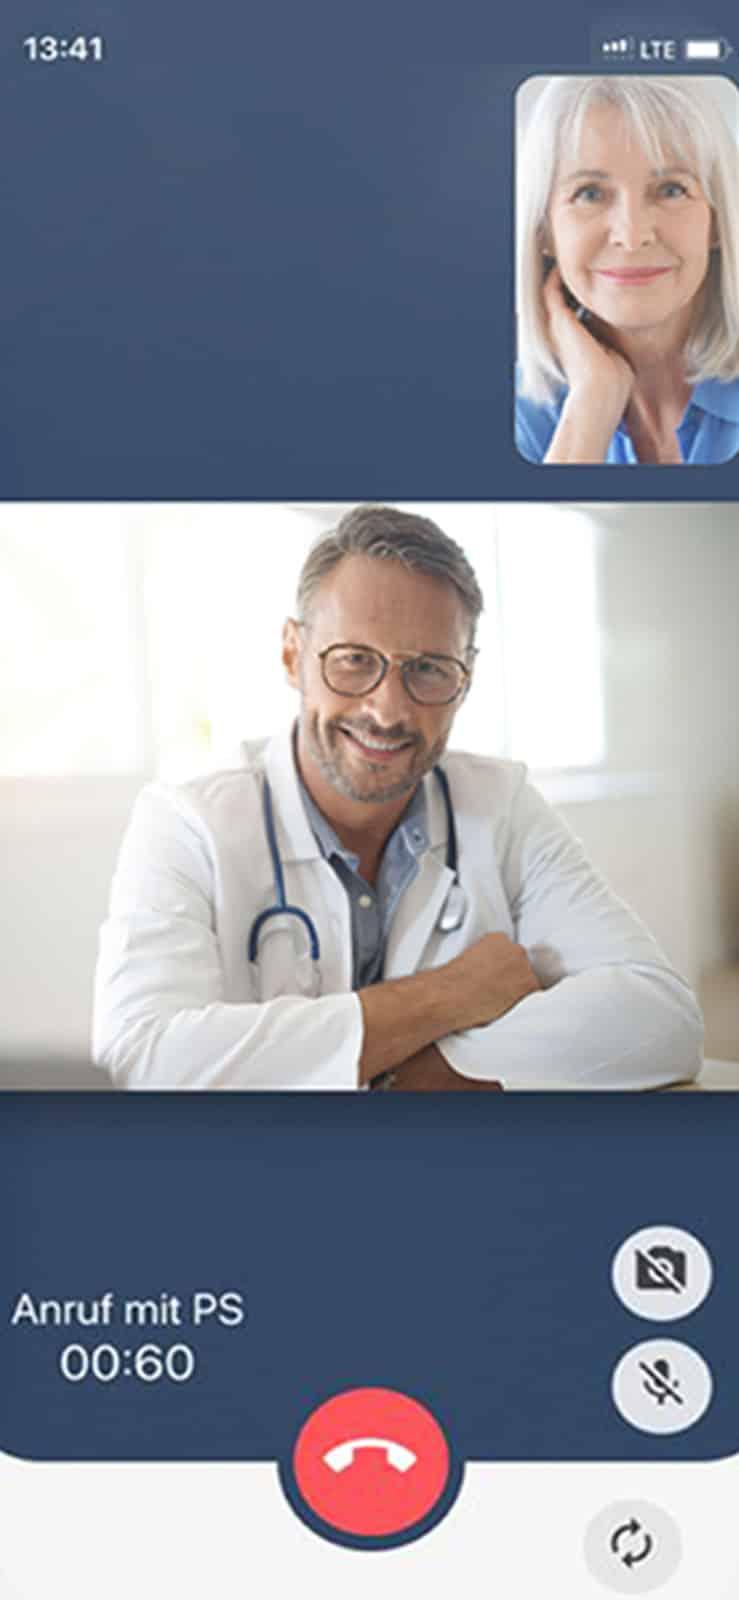 Screenshot principa Patientenapp